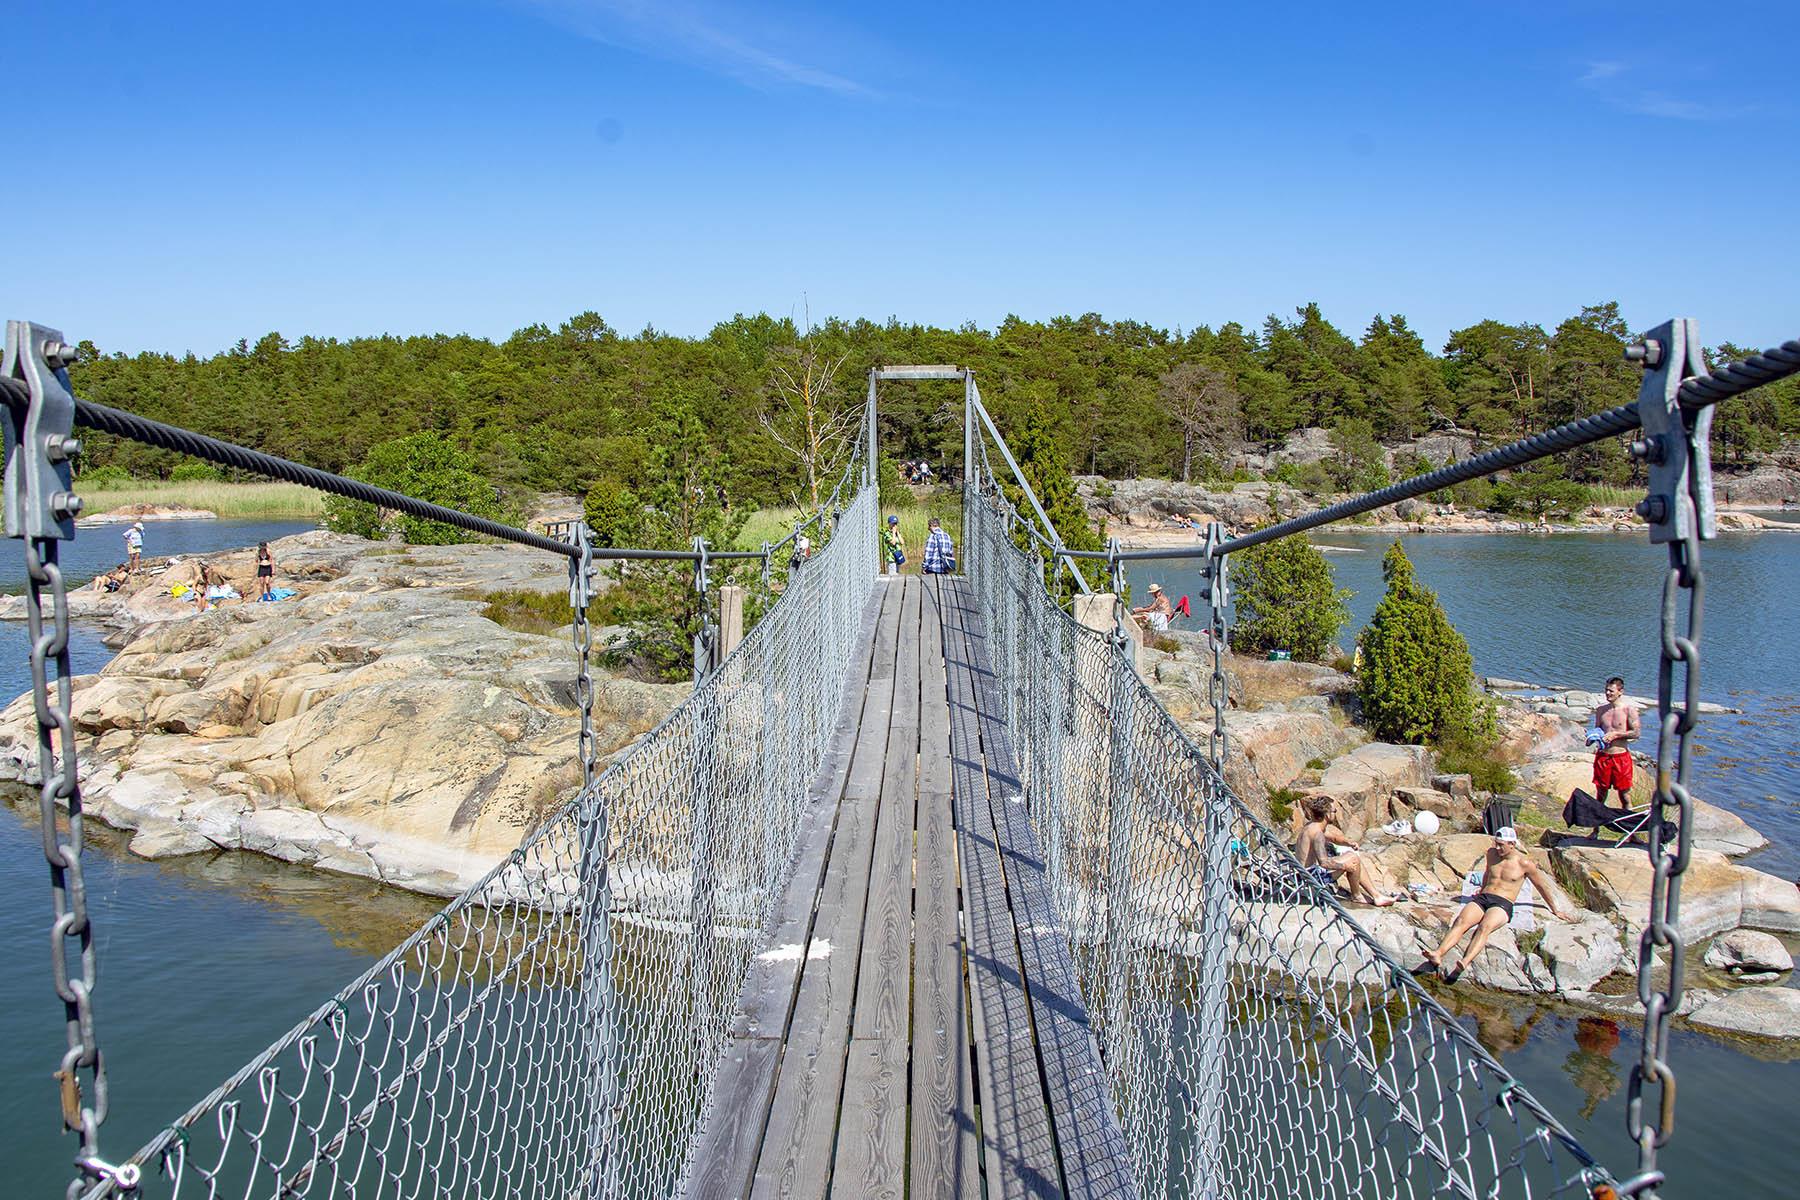 Stendörrens naturreservat Stora Krokholmen